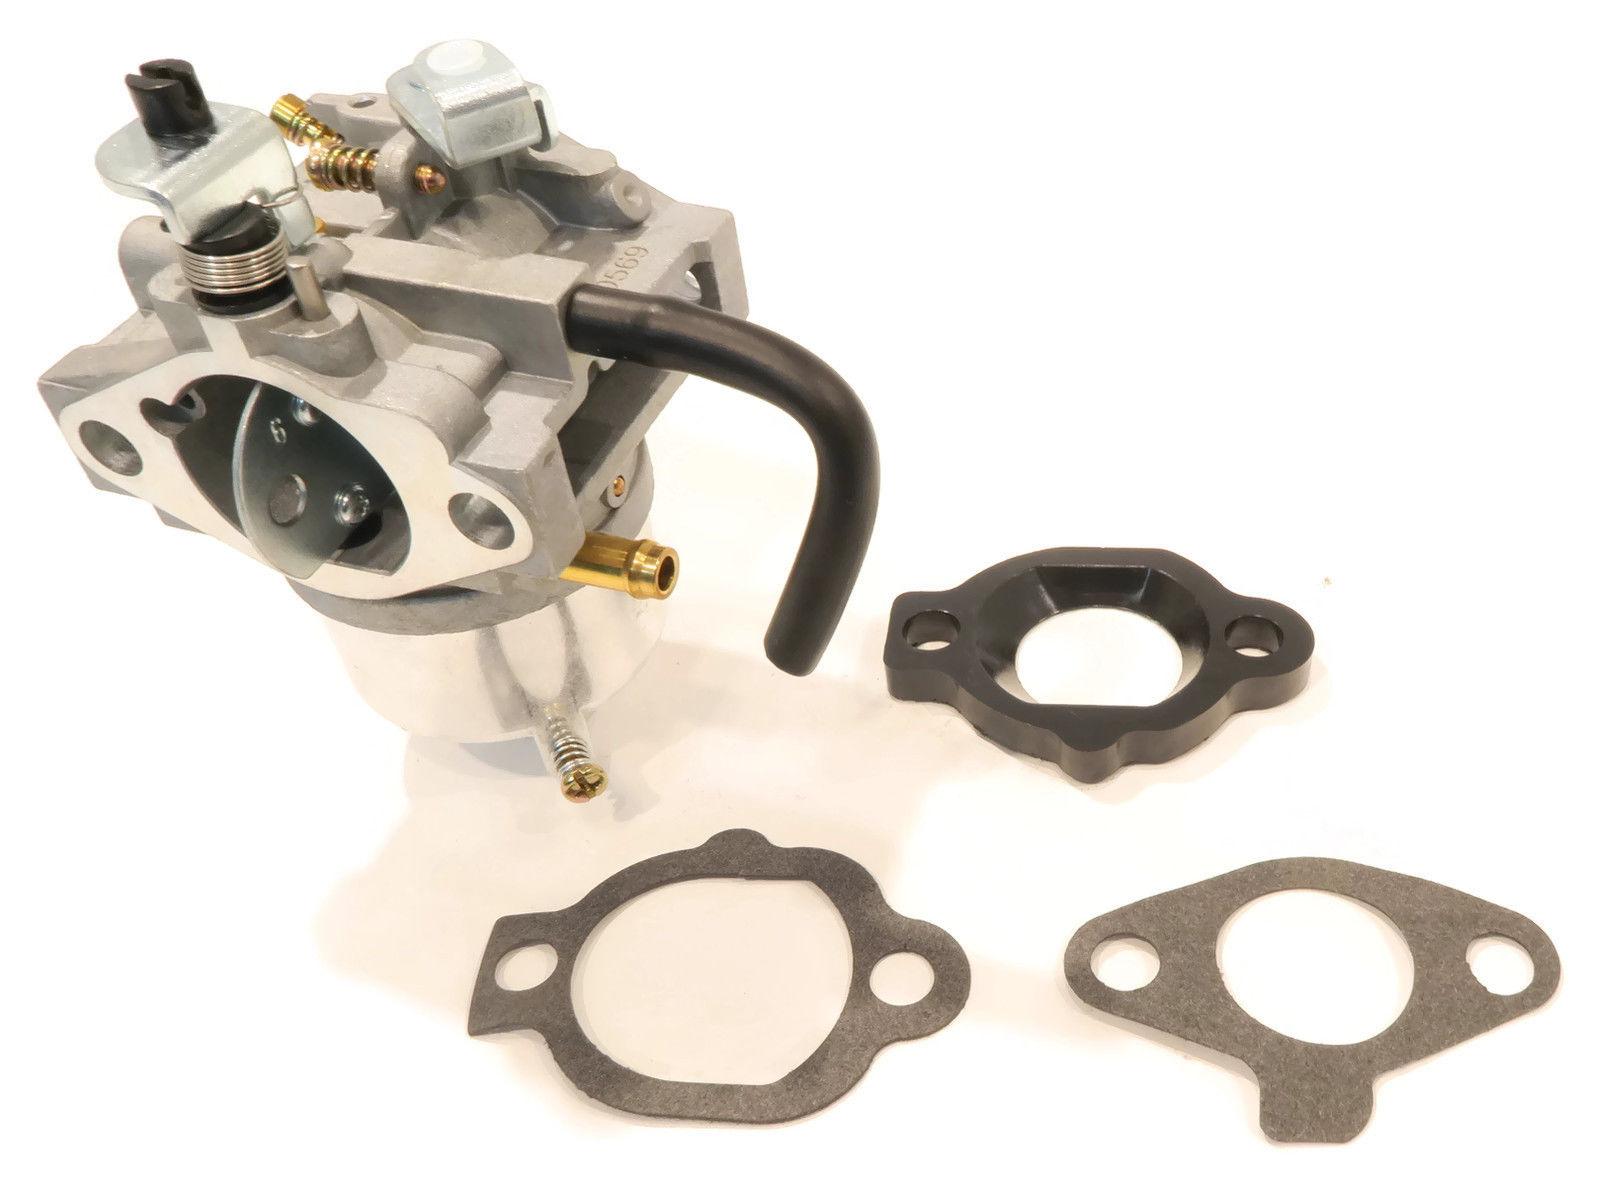 CARBURETOR W/ GASKETS INSULATOR KIT 492256  FOR SNAPPER MURRAY BRIGGS&STRATTON 260000 261000 MODEL ENGINE 282028 272121